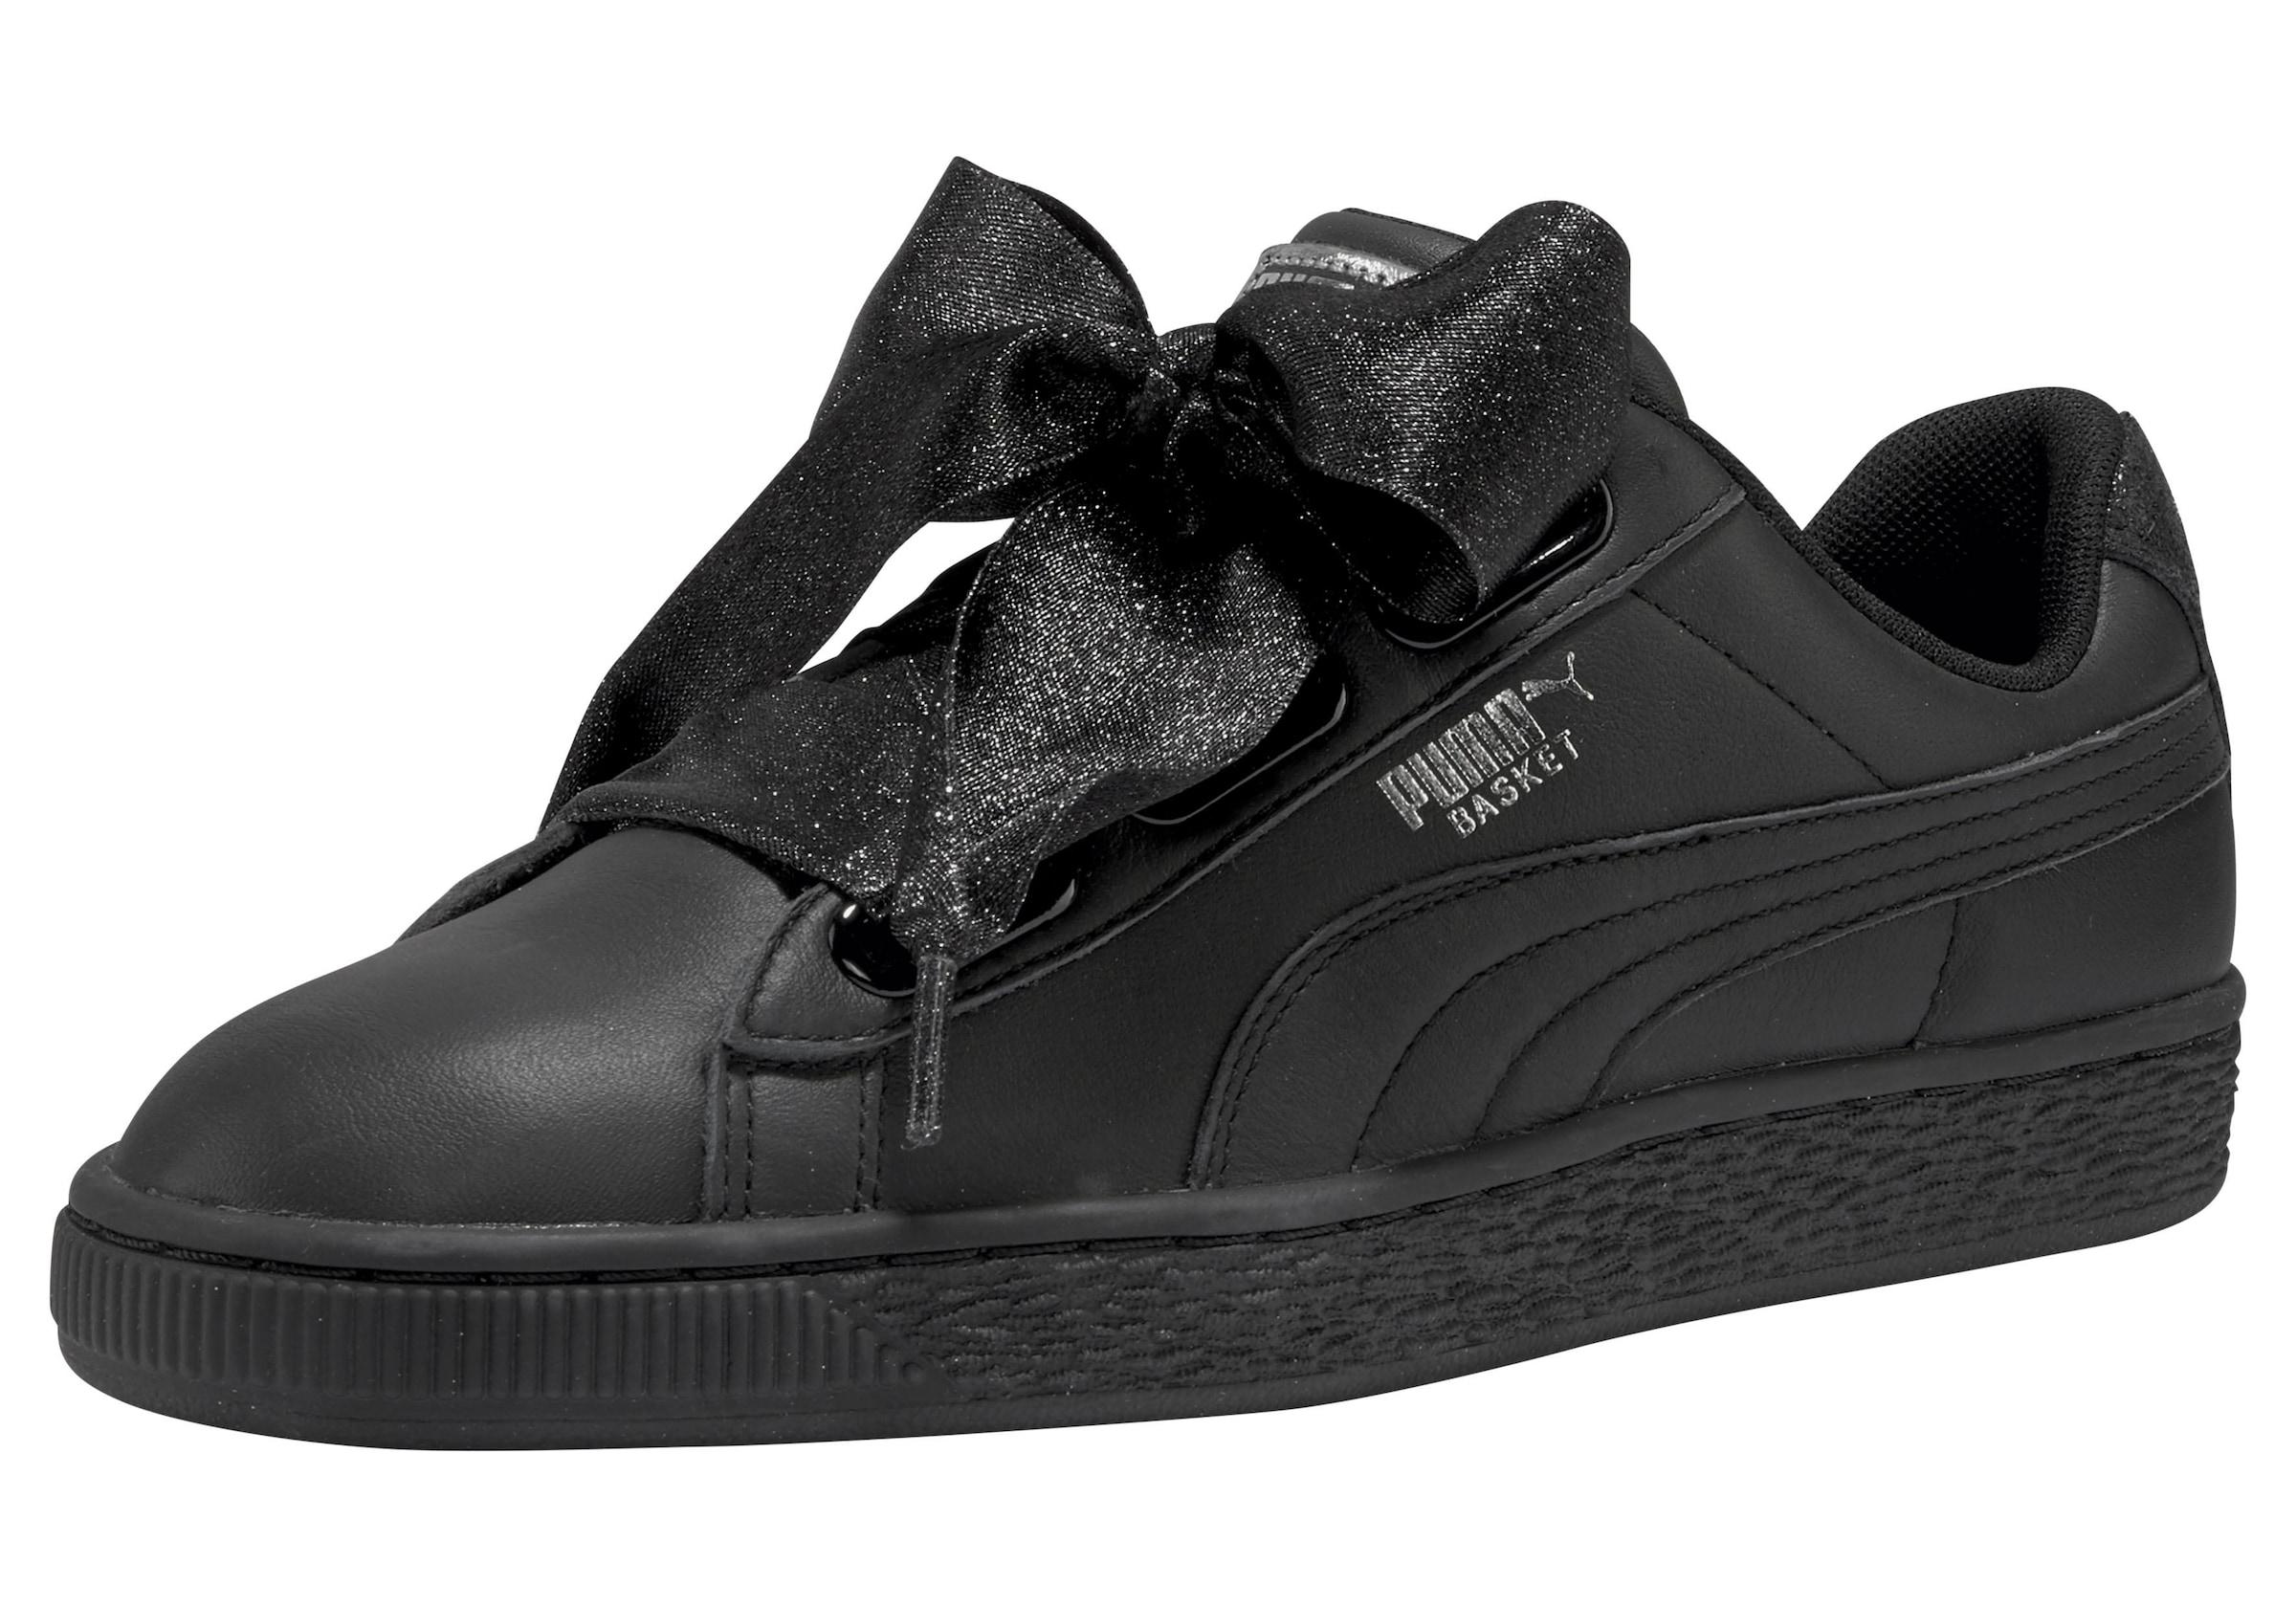 PUMA Sneaker »Basket Heart Bio Hacking« kaufen | BAUR